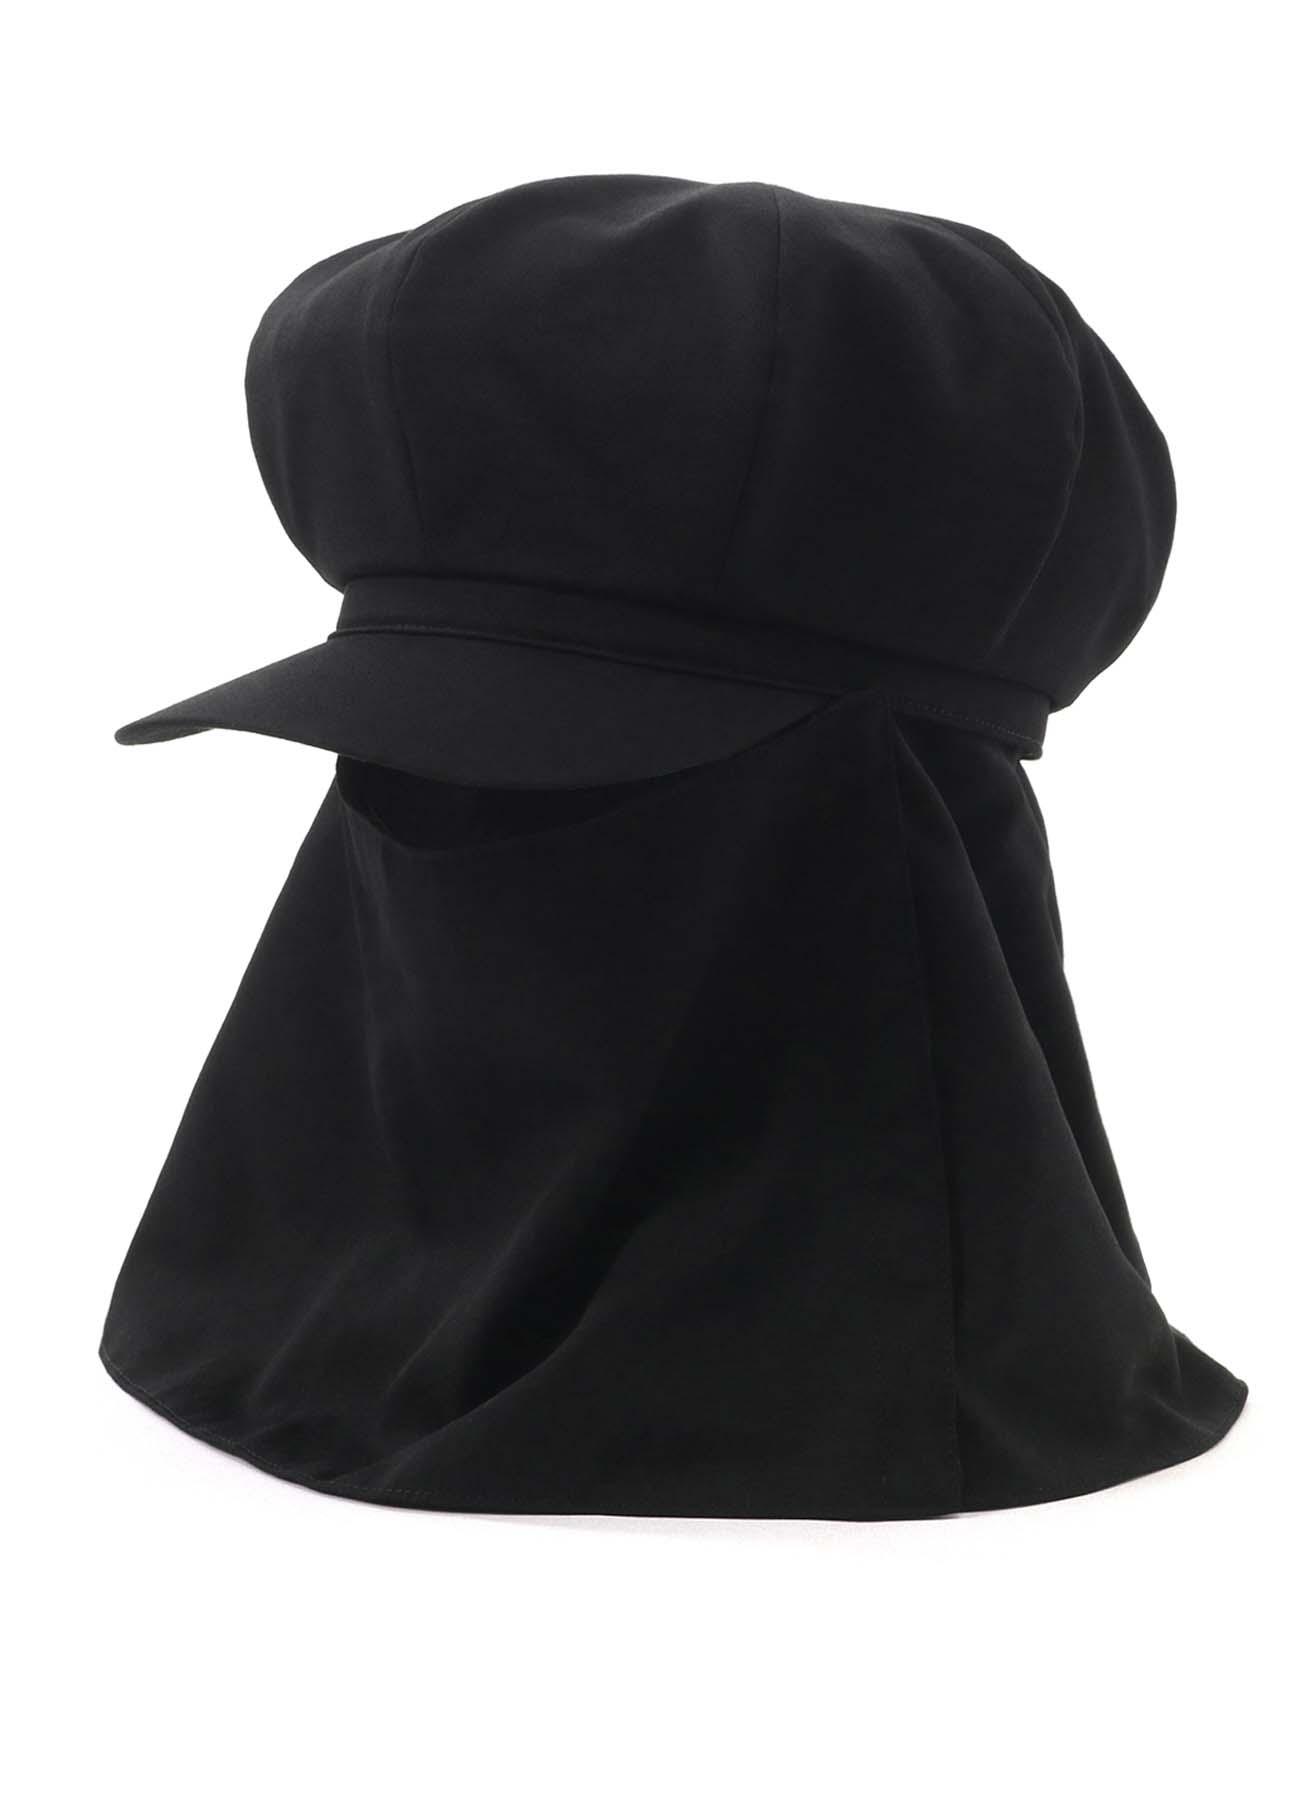 GABARDINE DUST PROOF NEWSBOY CAP